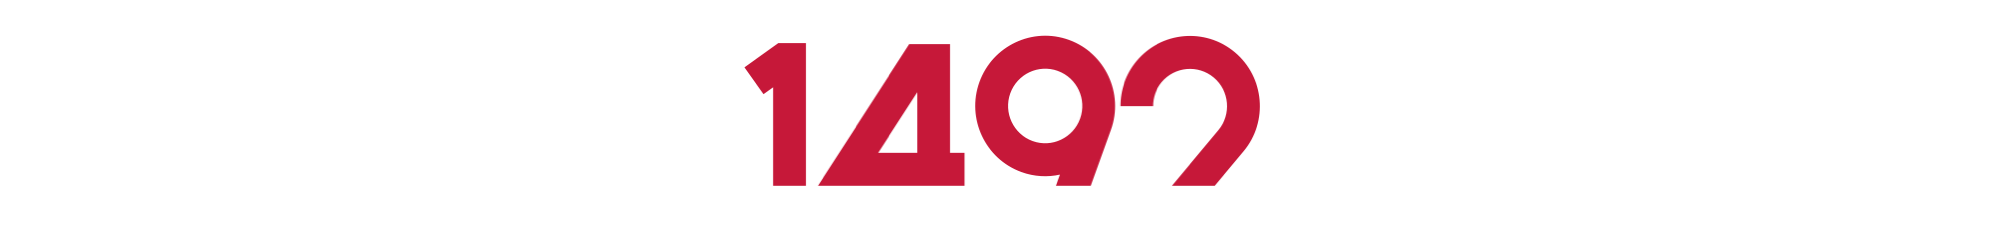 logo 1492 small